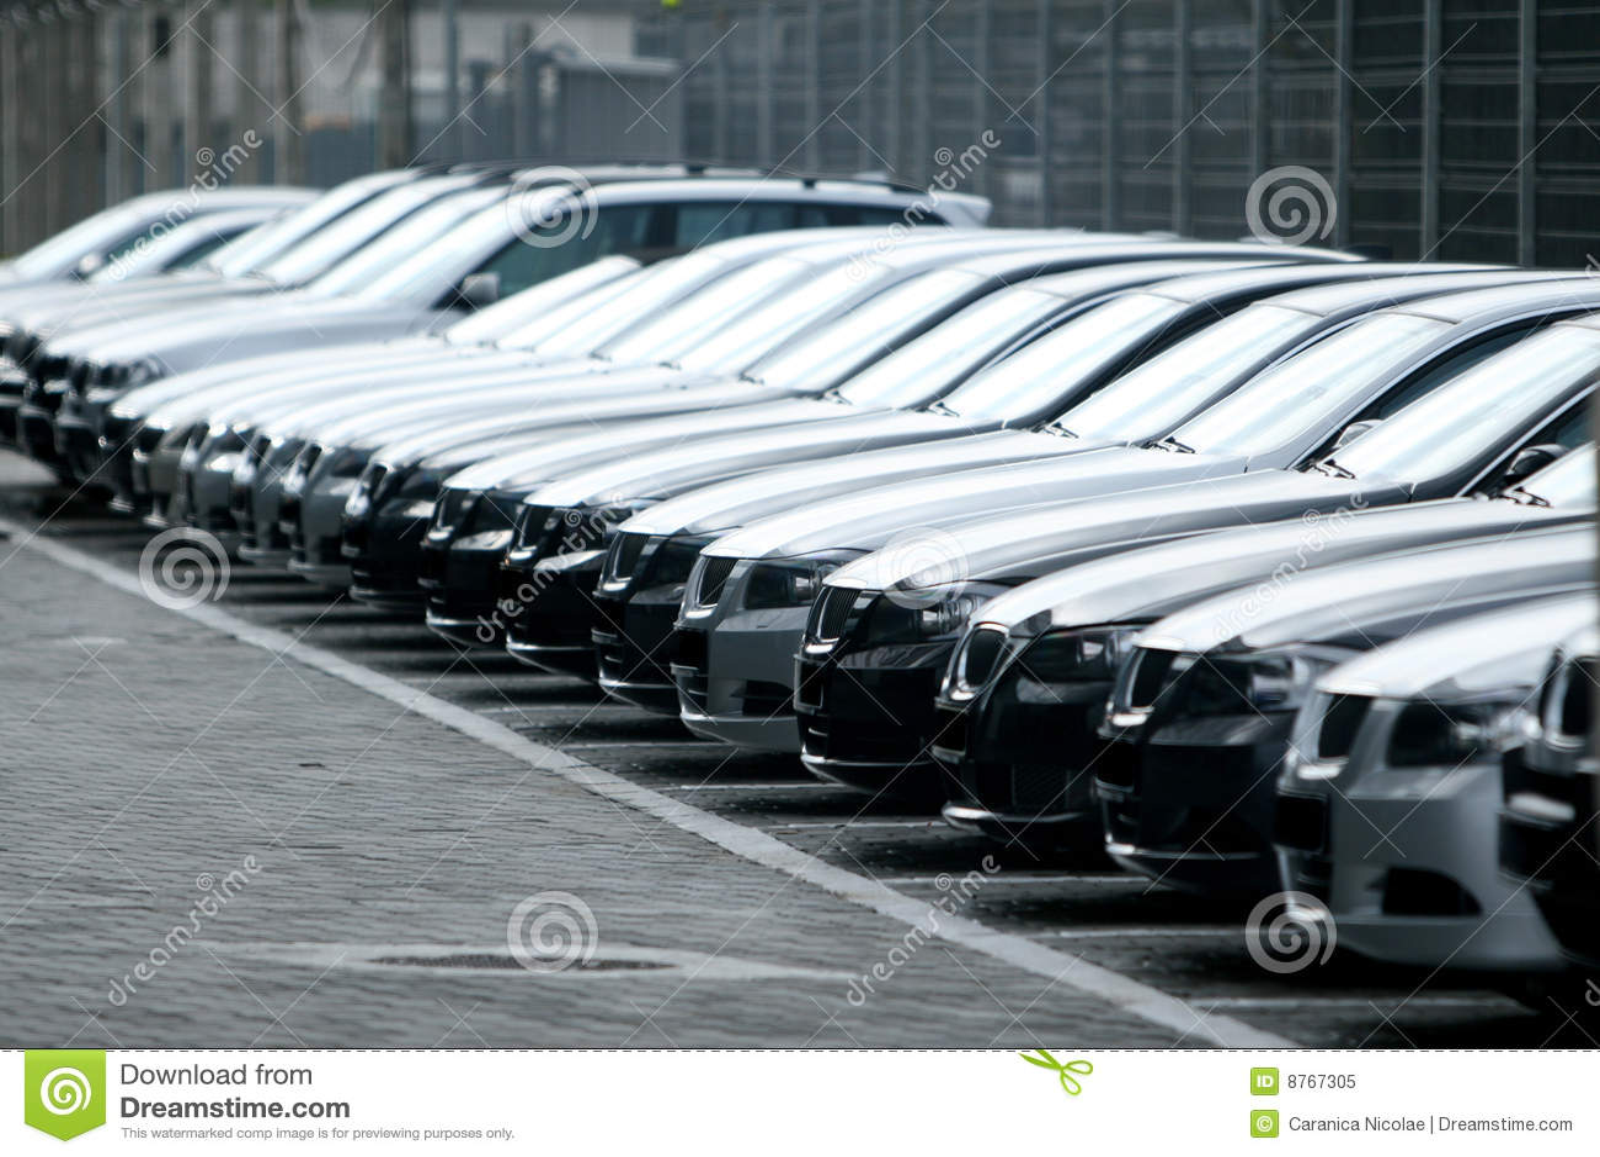 fleet of cars royalty free stock photo image 8767305. Black Bedroom Furniture Sets. Home Design Ideas